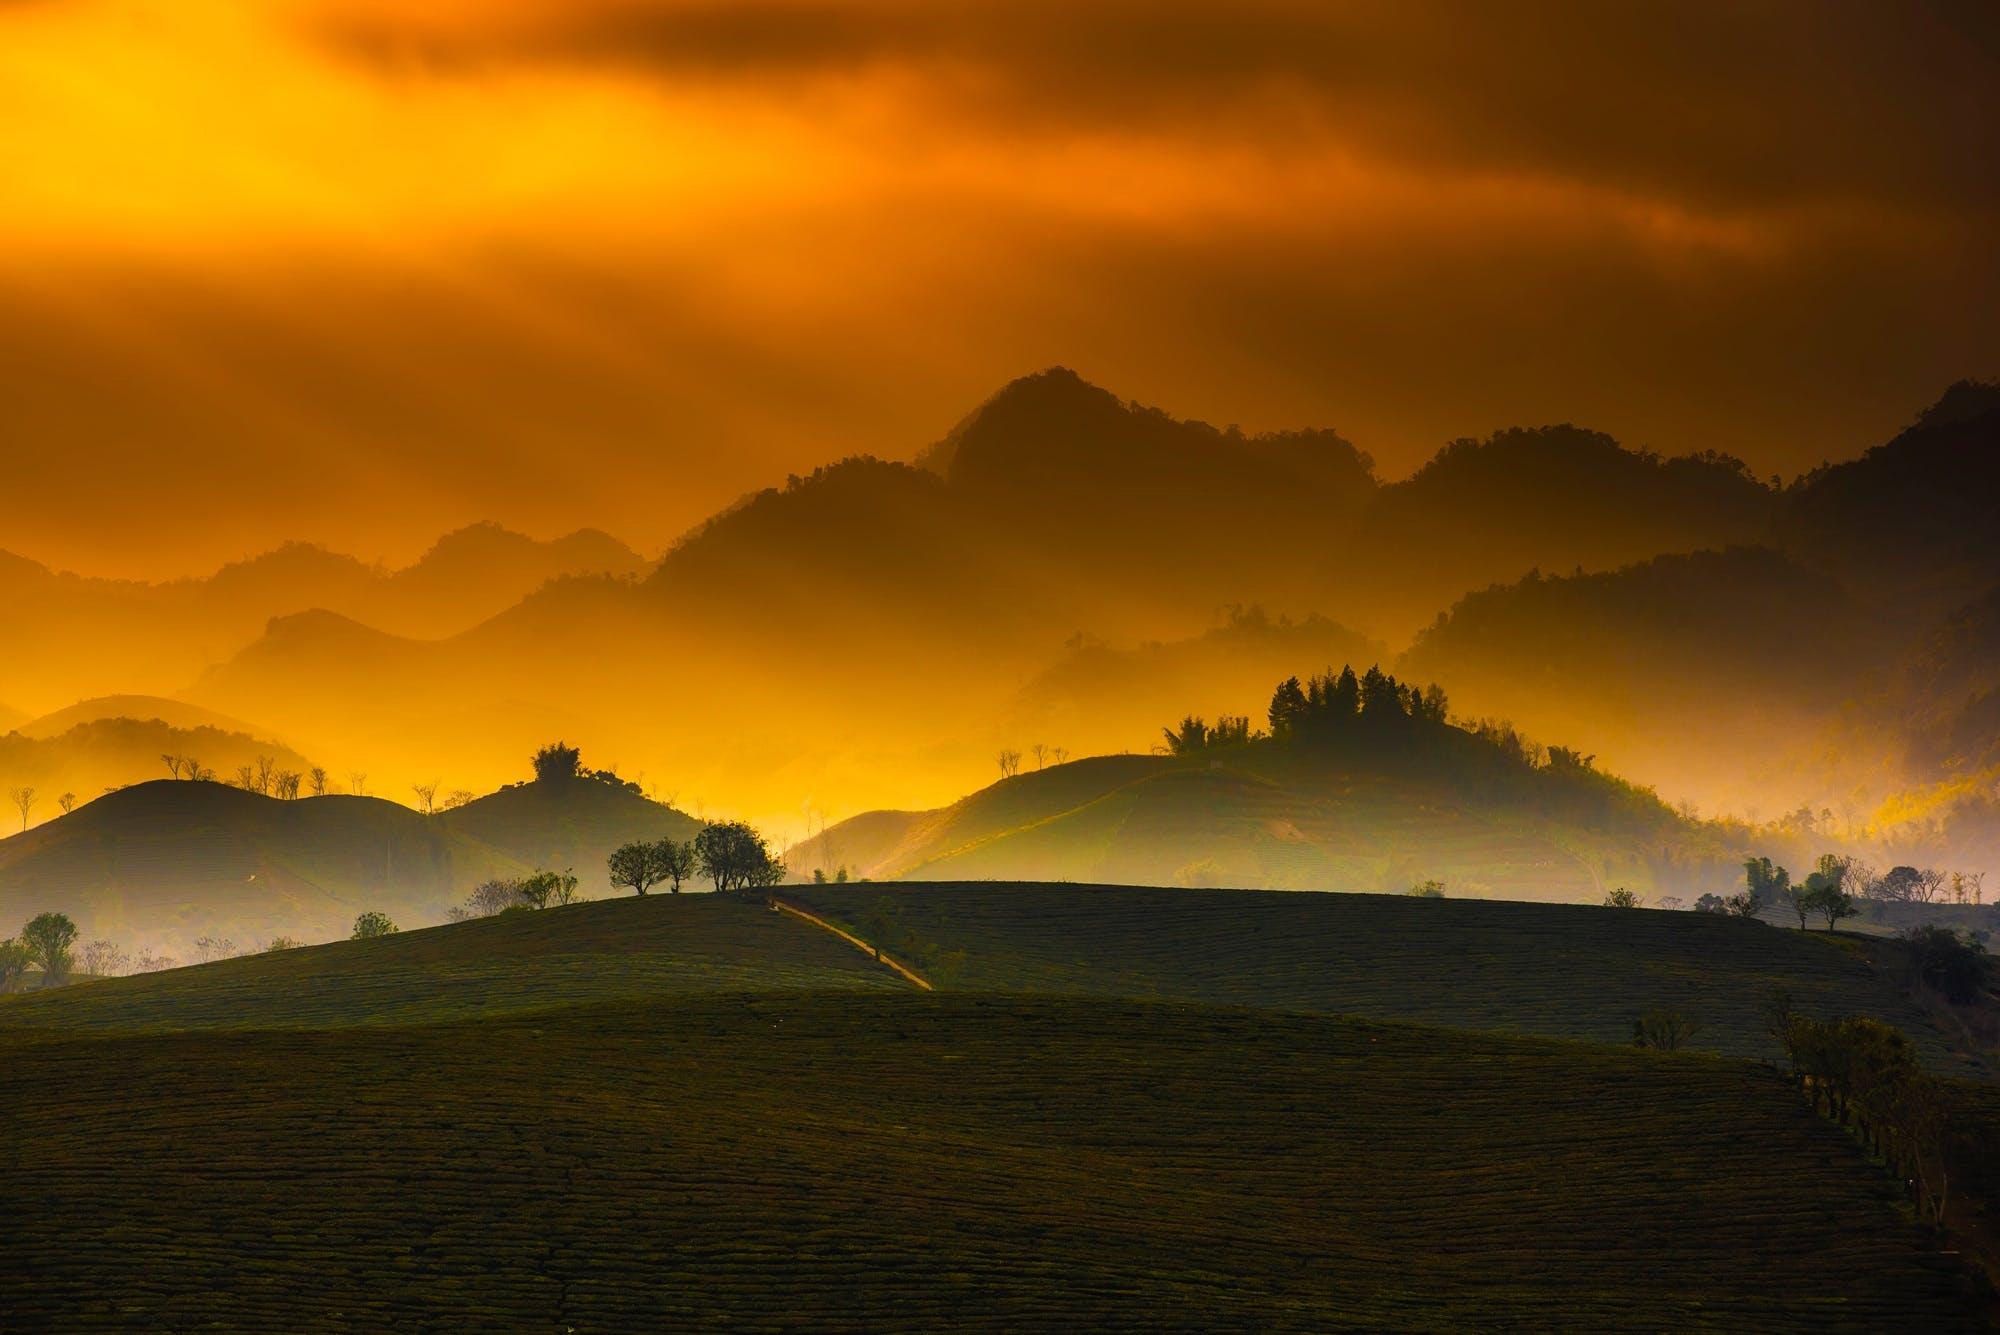 Giant Smoky Mountain National Park